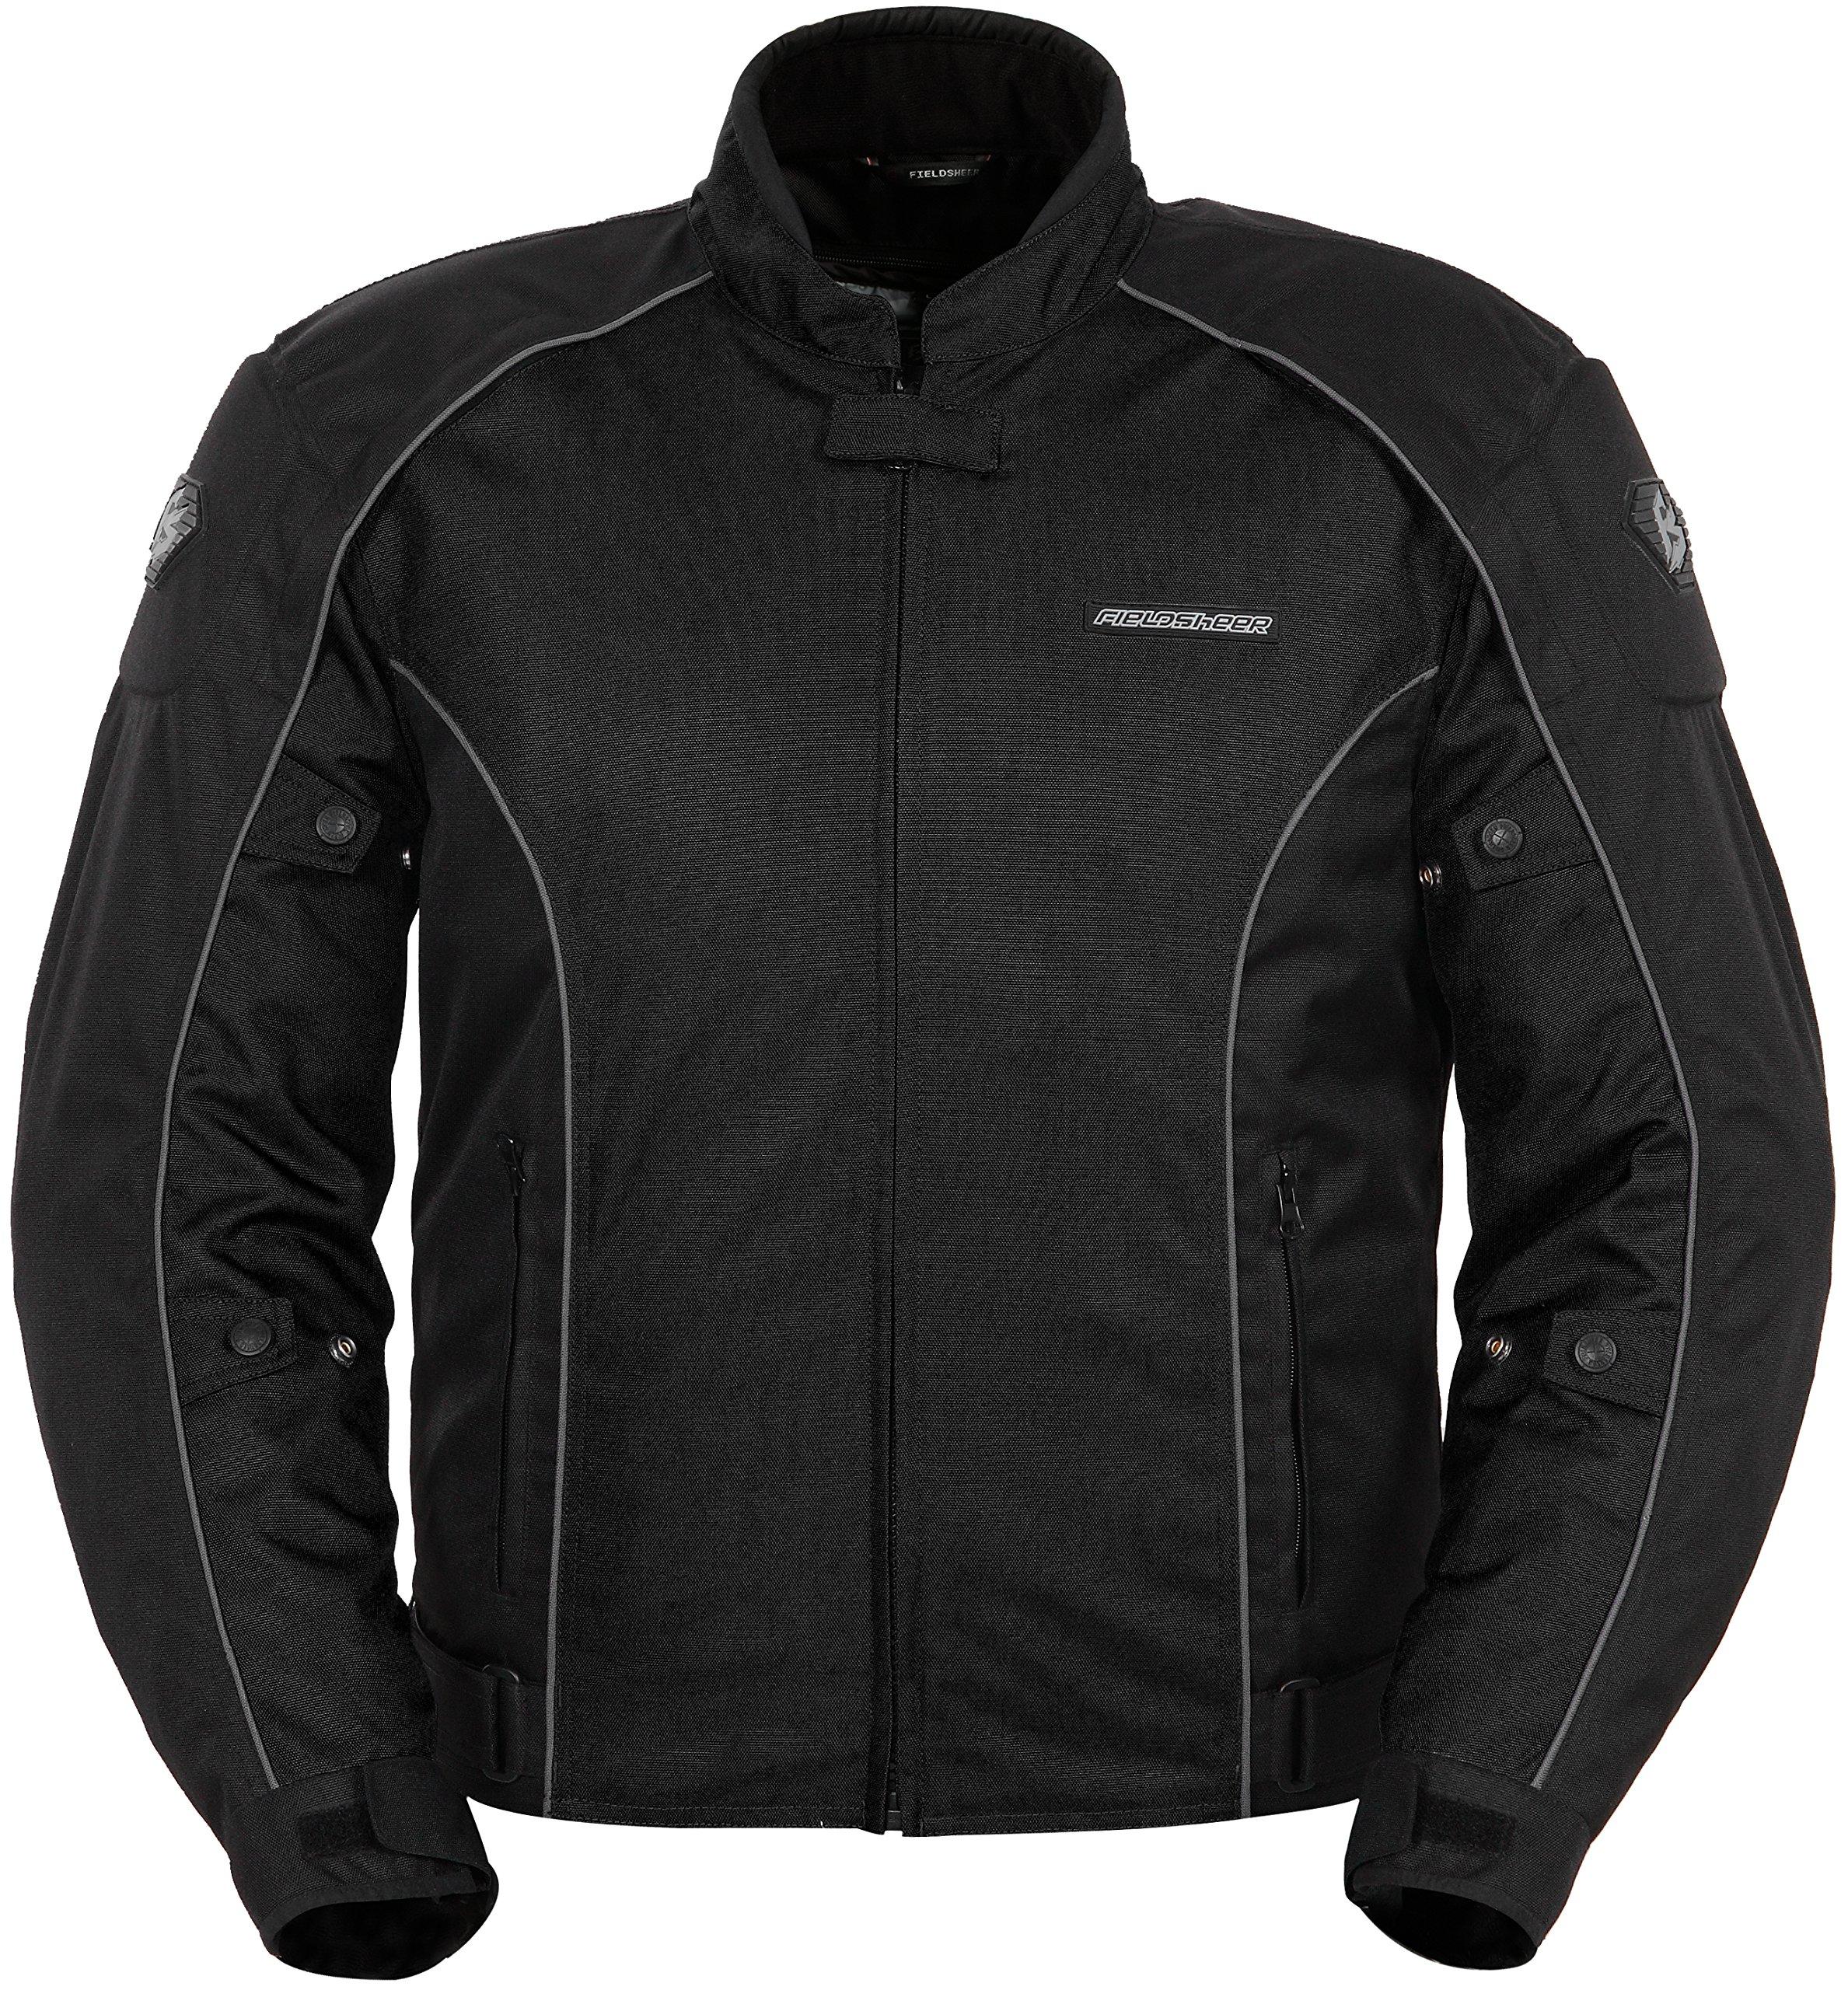 Fieldsheer Mens Aqua Sport 2.0 Black Jacket - 3XL